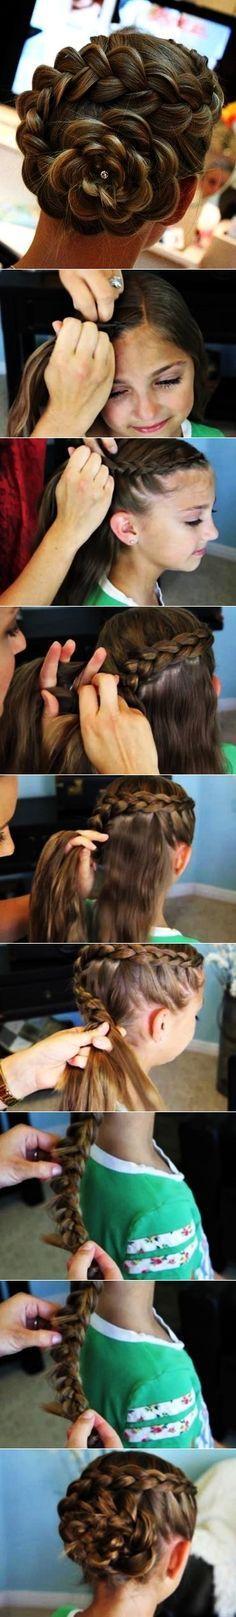 Beautiful #Rose #DIY #Hairstyle Photo #Tutorial